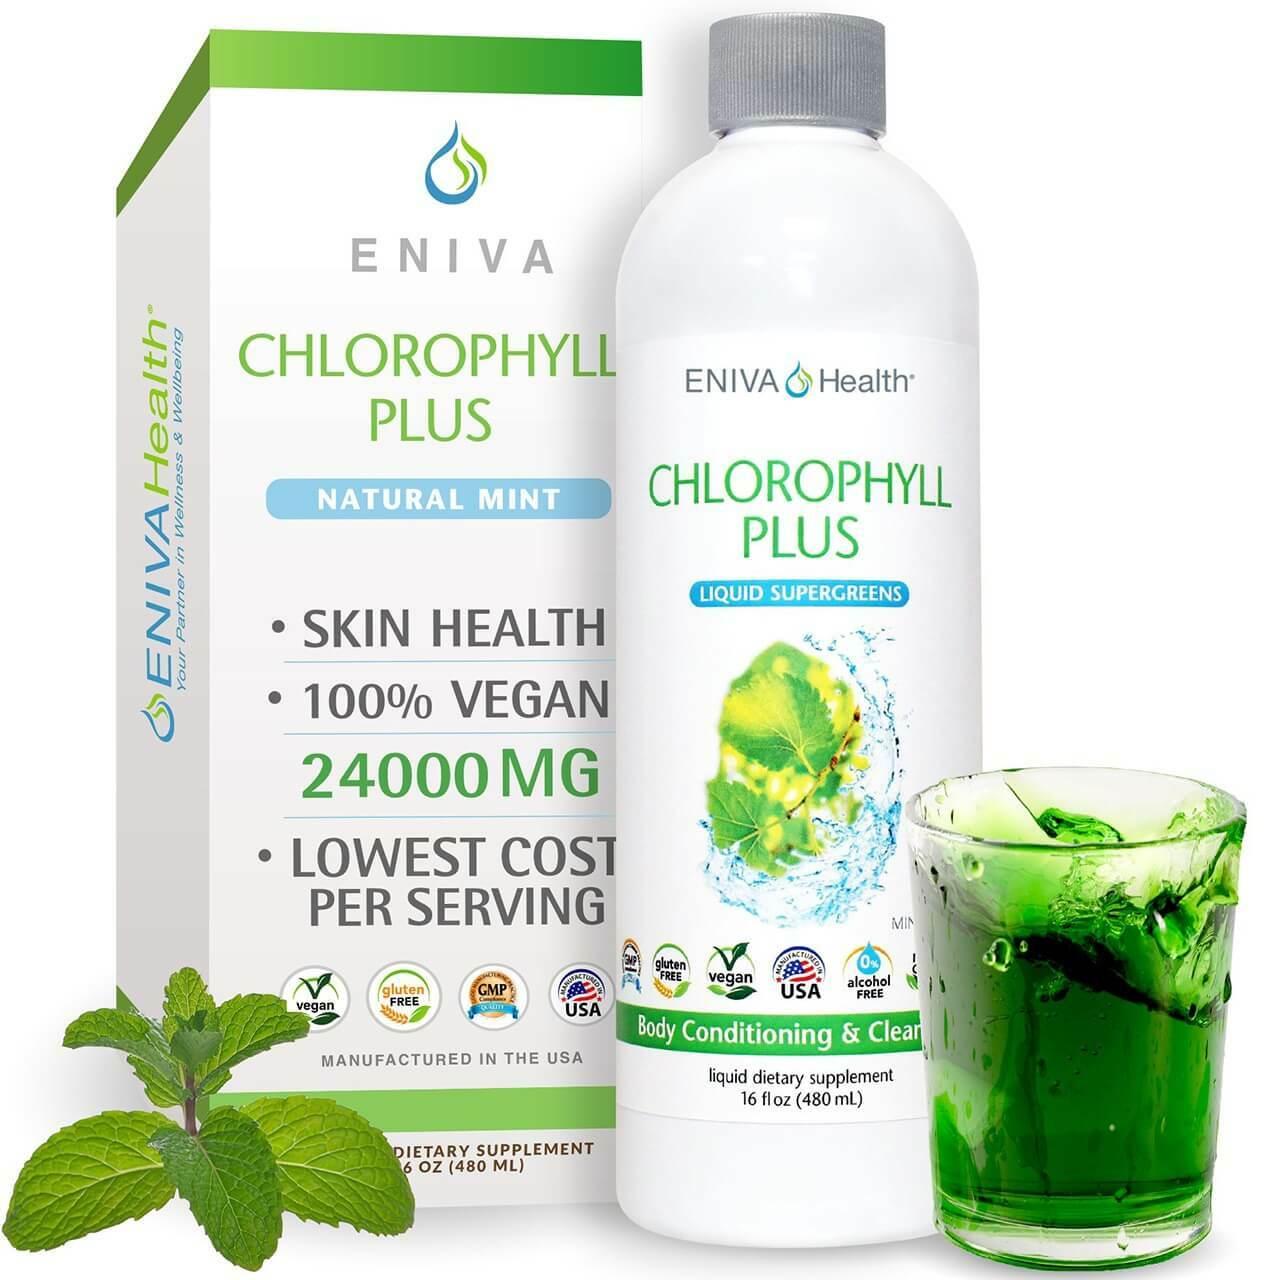 Chlorophyll #1 at controlling body odor